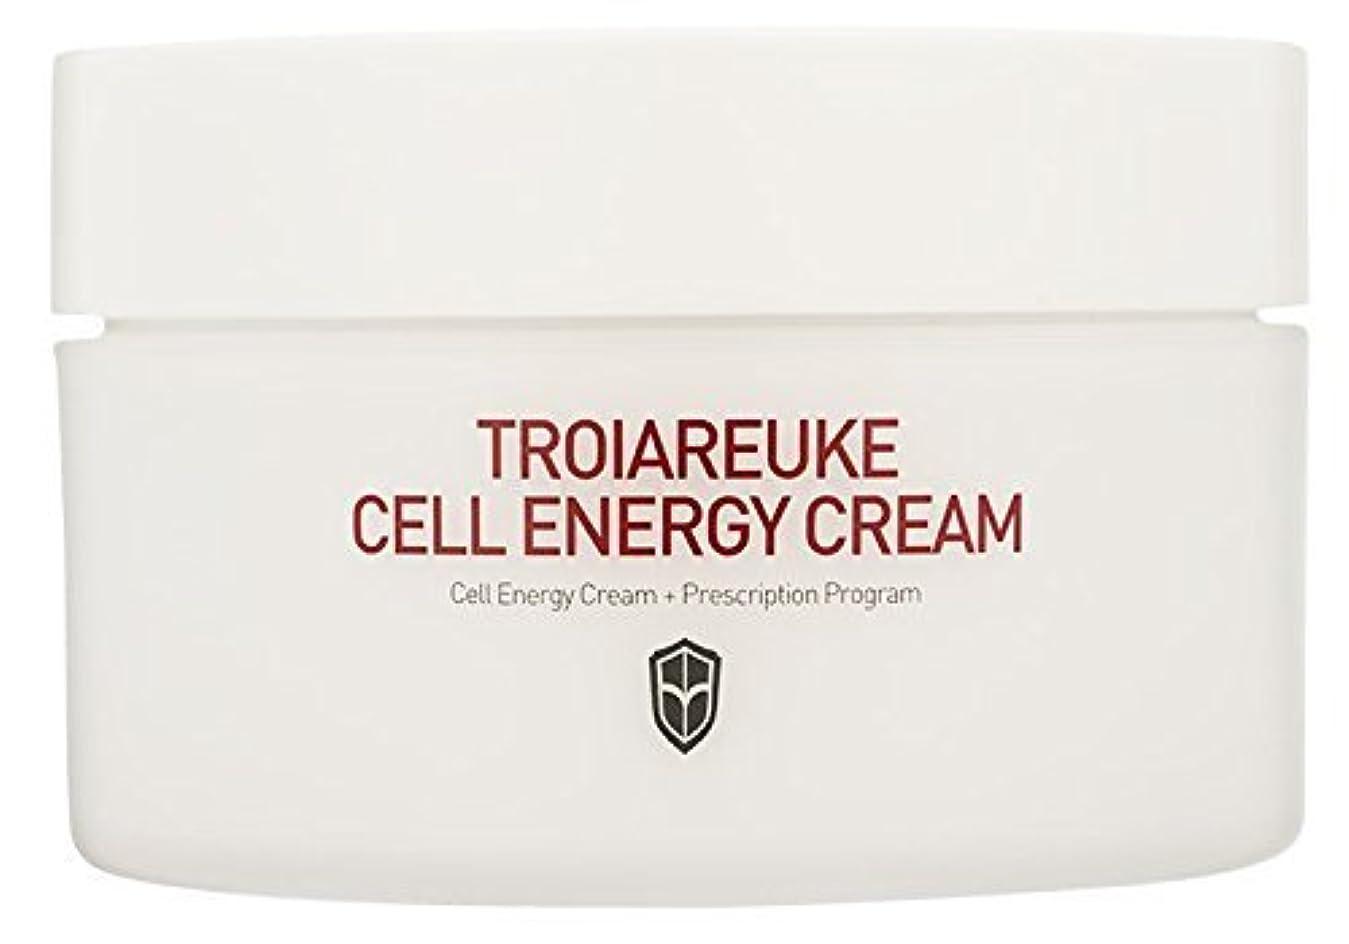 TROIAREUKE セル エネルギー クリーム / Cell Energy Cream (125ml) [並行輸入品]